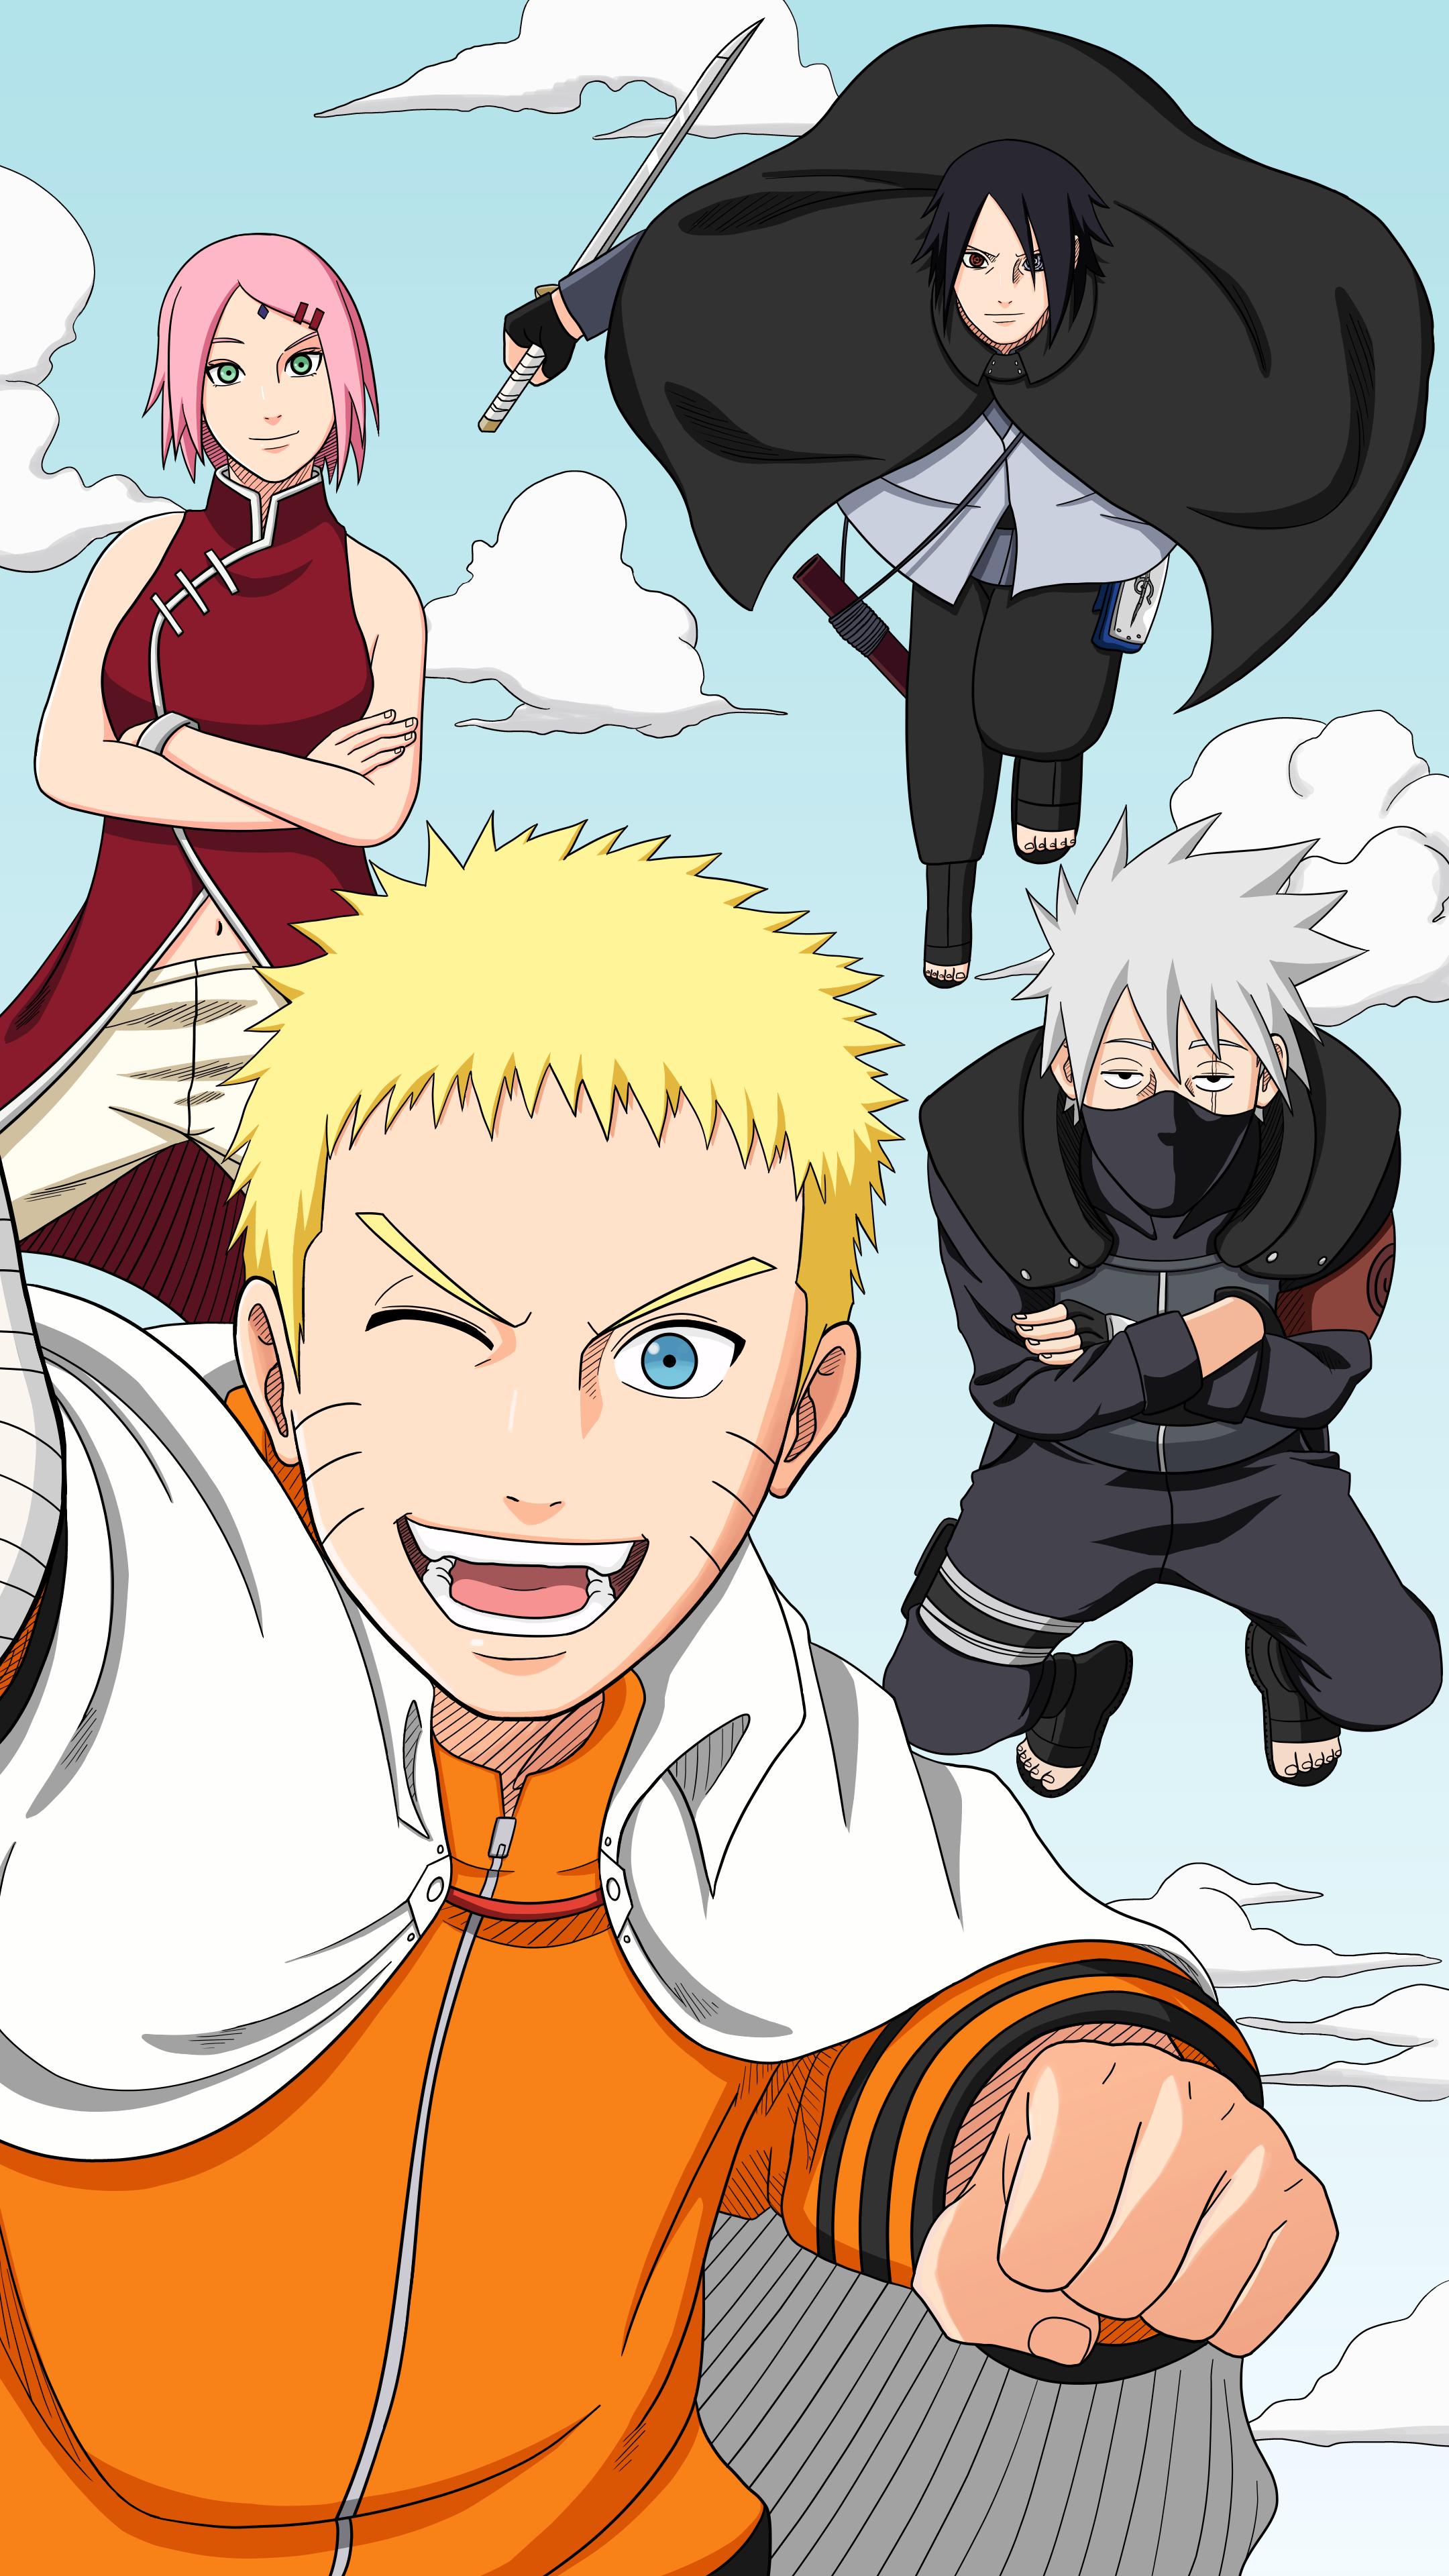 A Team 7 Wallpaper I Made For Myself Naruto Anime Manga Naruto Teams Naruto Team 7 Naruto Shippuden Anime